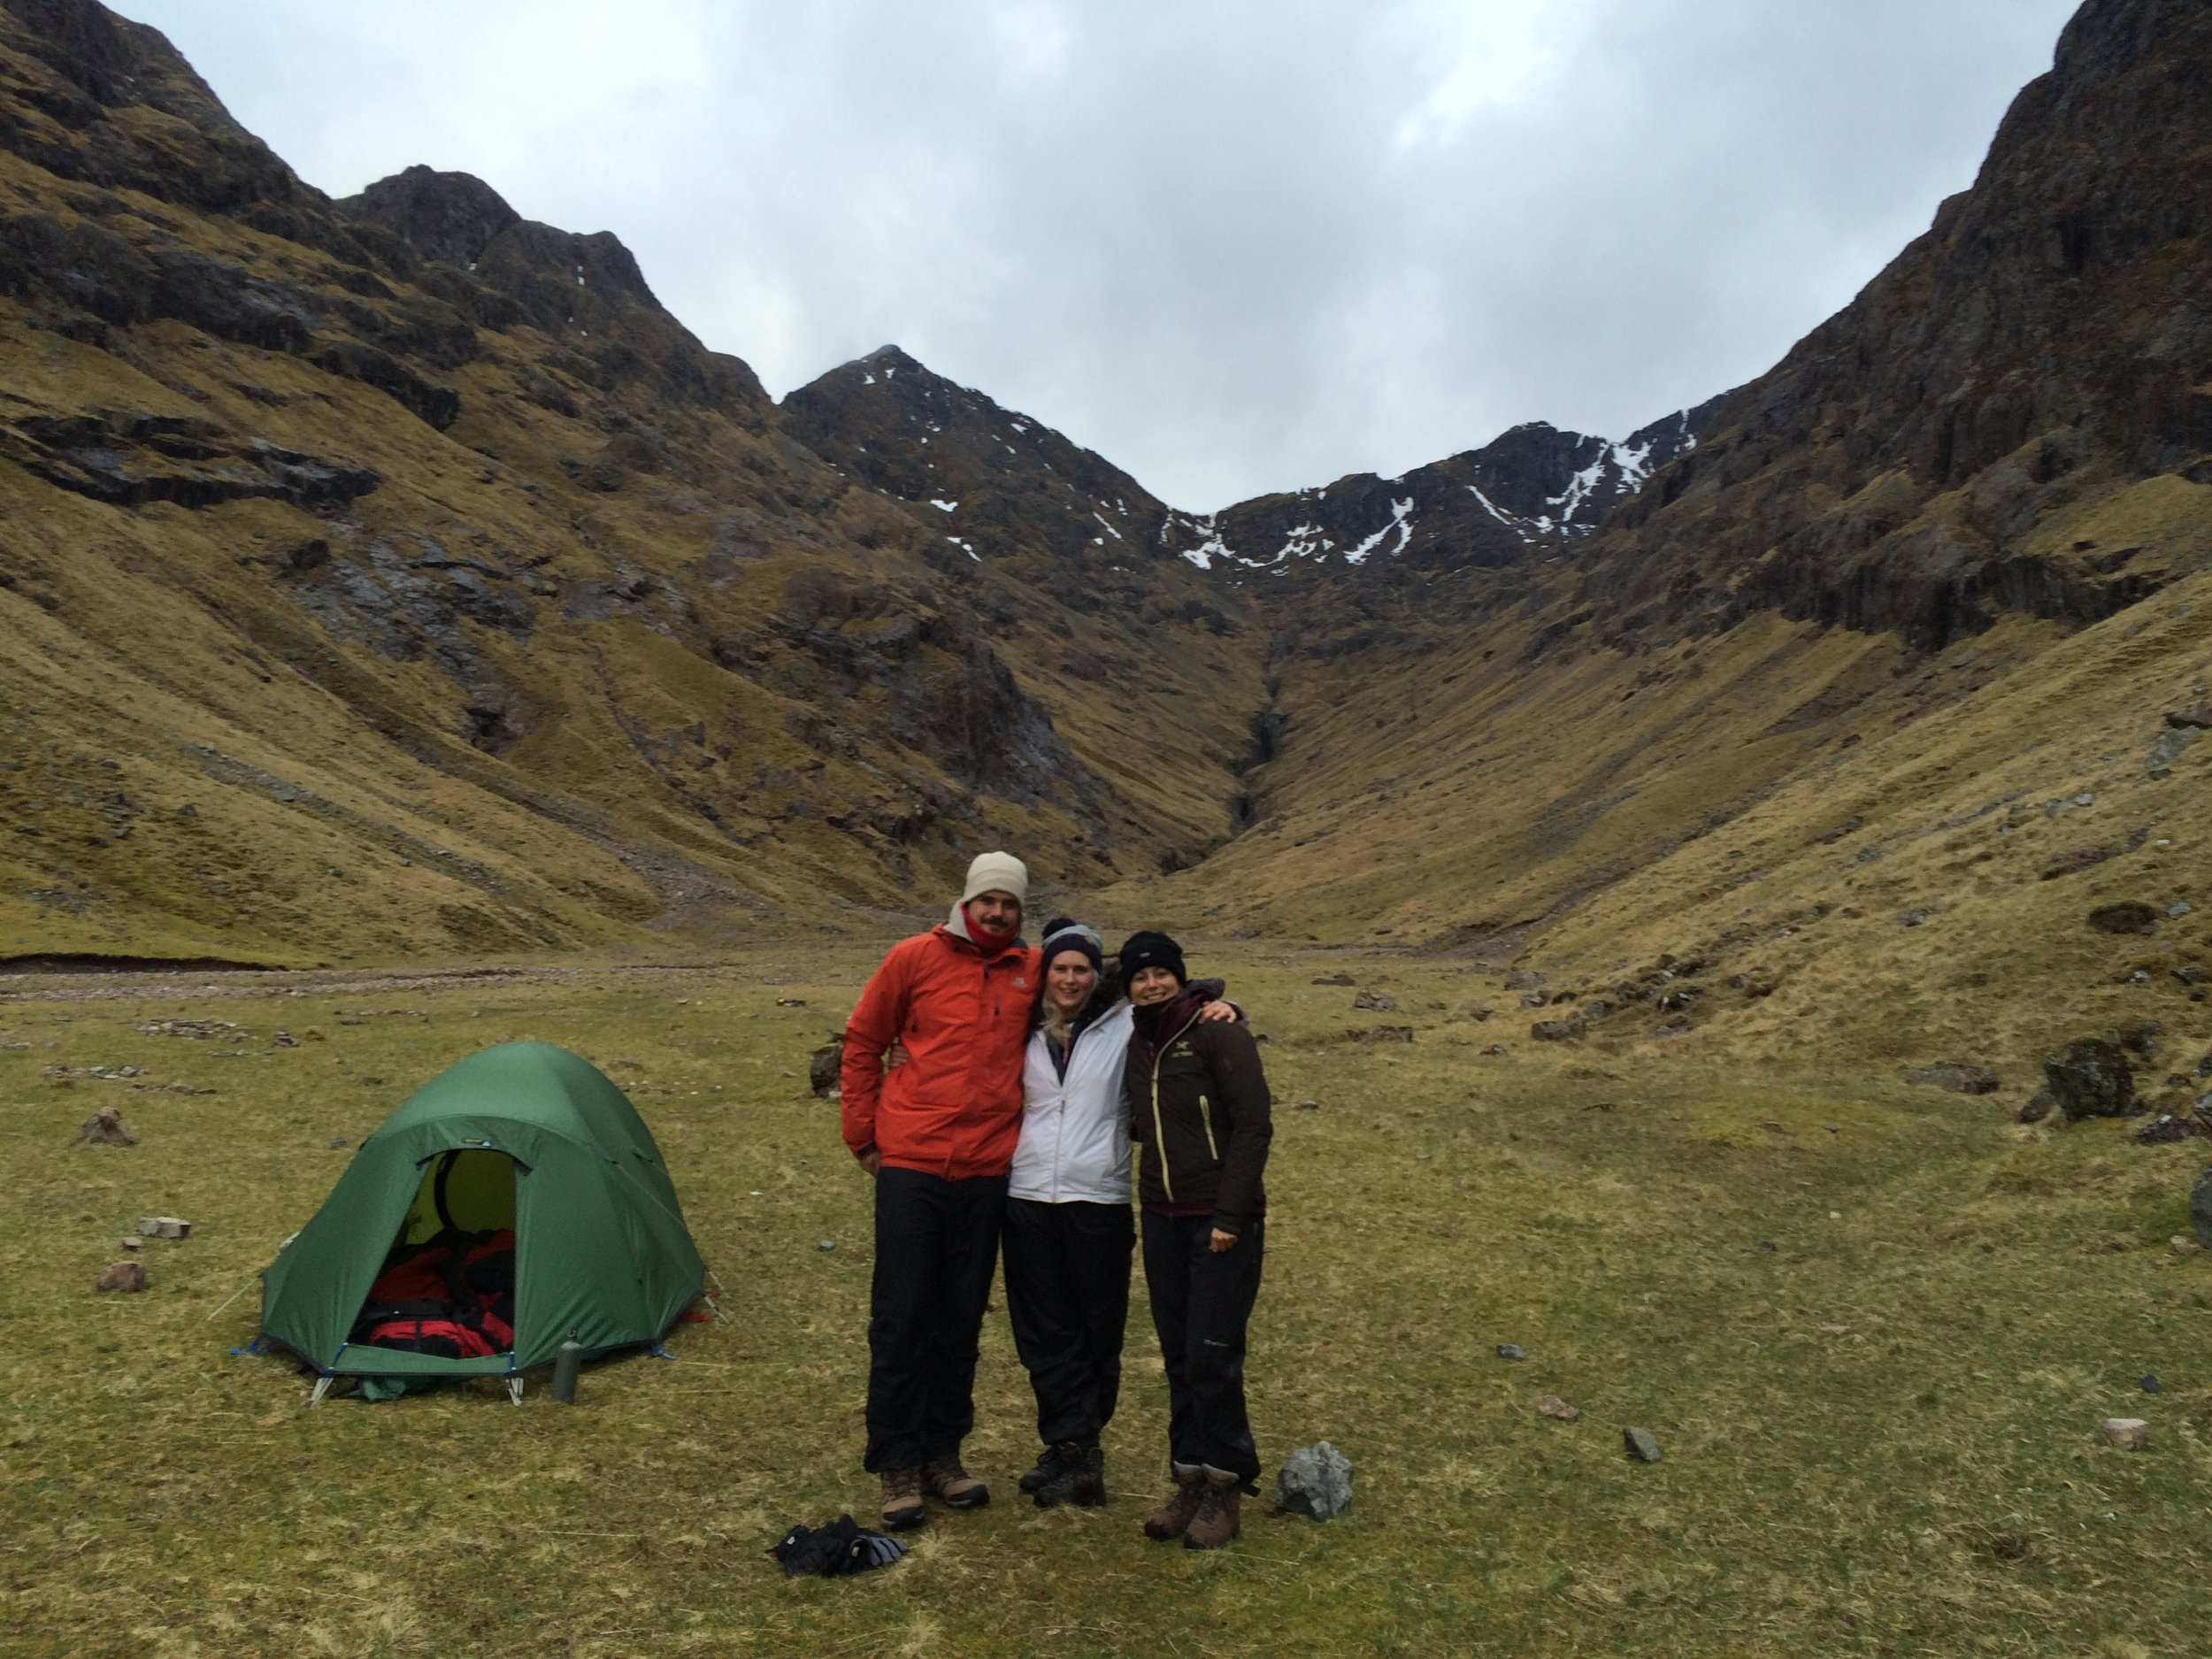 Lost Valley wild camp